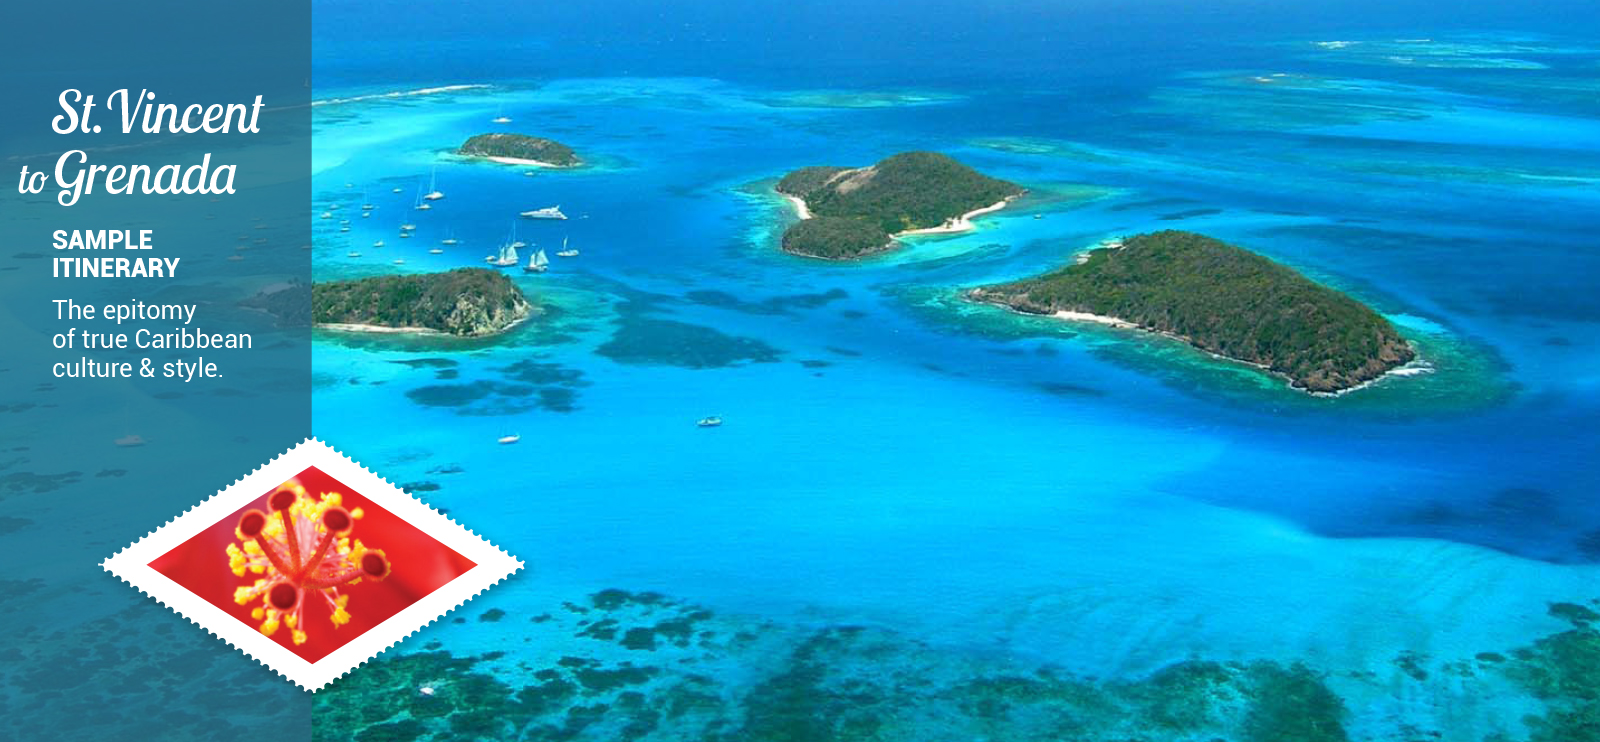 116-Yacht-Whisper-Destination-St-Vincent-Grenada-1.jpg